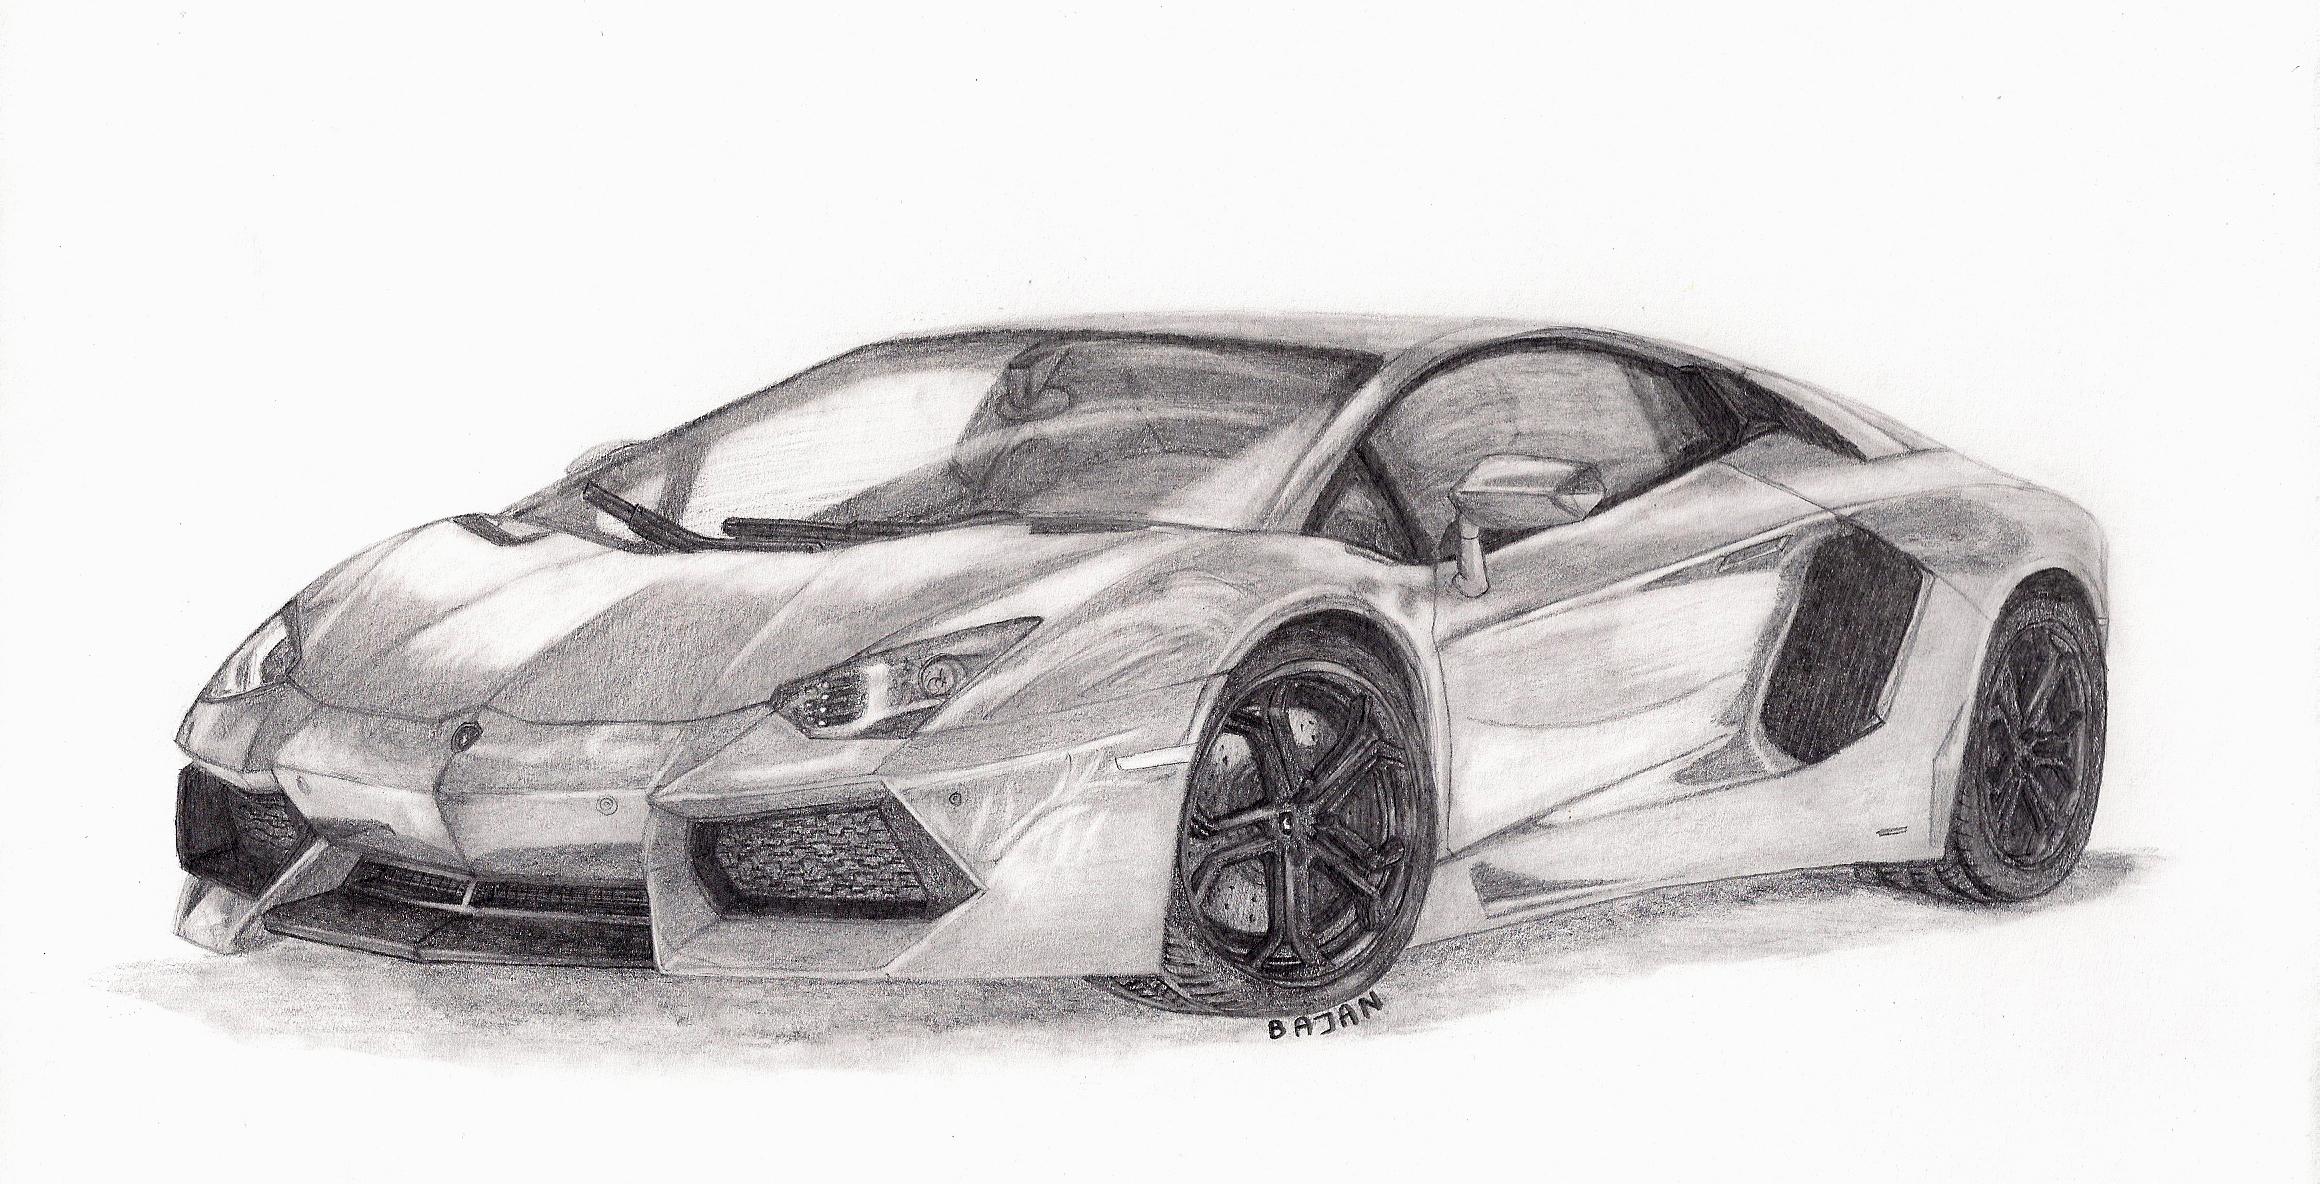 Lamborghini Aventador lp700-4 by Bajan-Art on DeviantArt